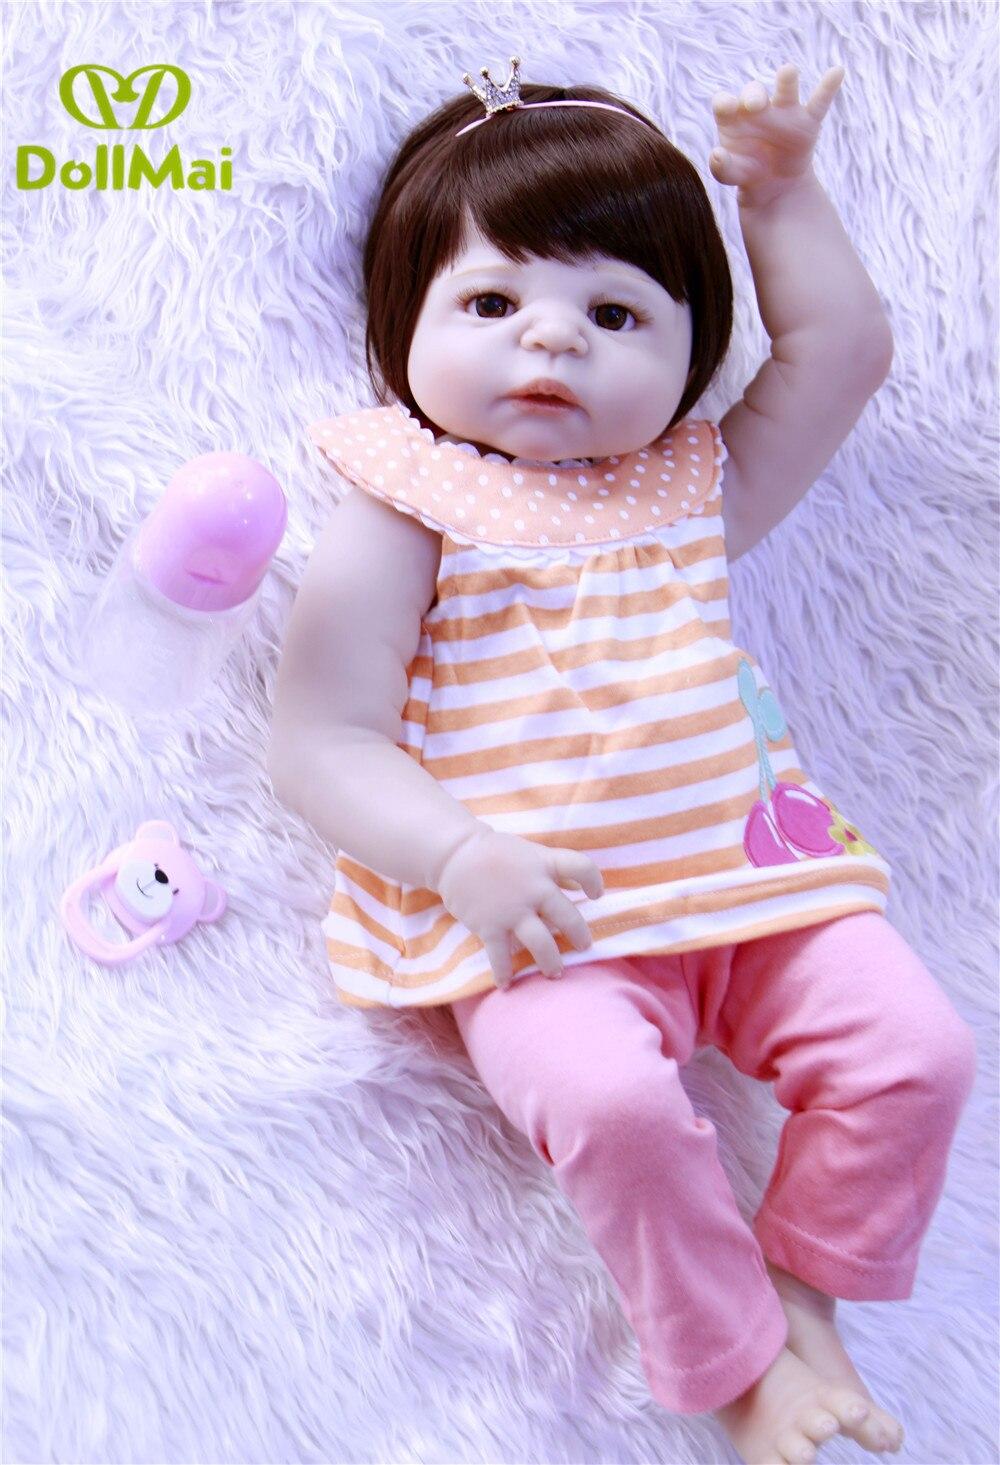 DollMai doll reborn 57cm full silicone reborn baby dolls newborn baby alive girl princess doll children gift toy dolls